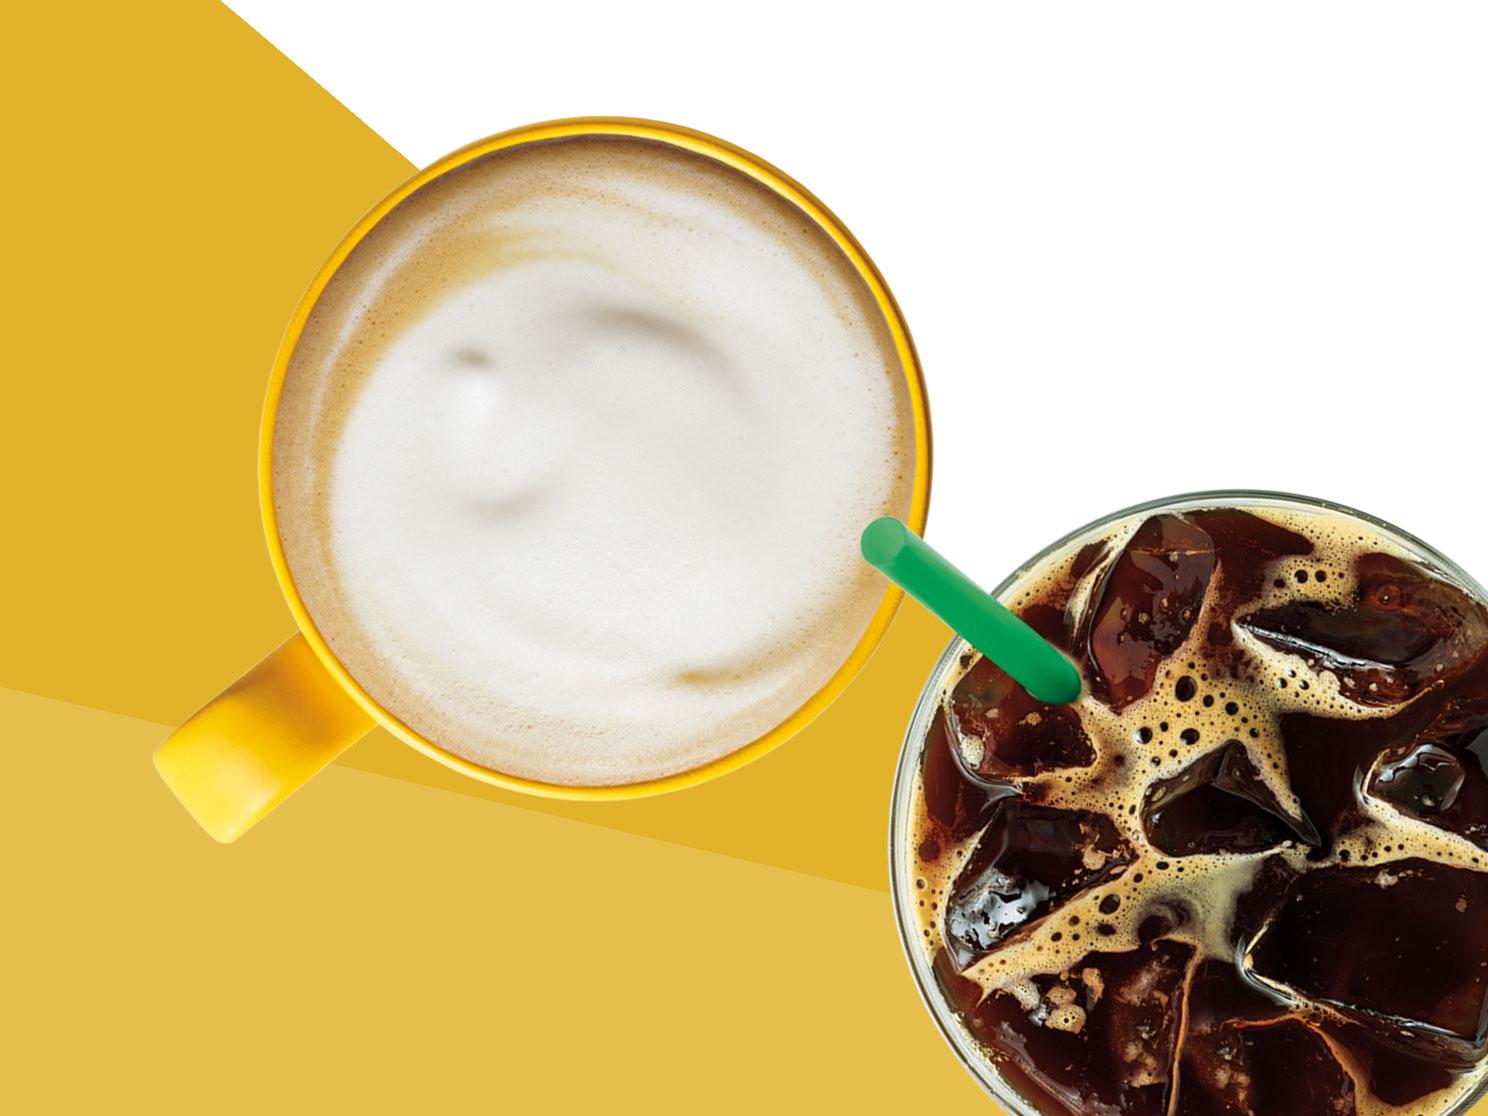 Starbucks Goes Blonde, Adds Second Espresso Option